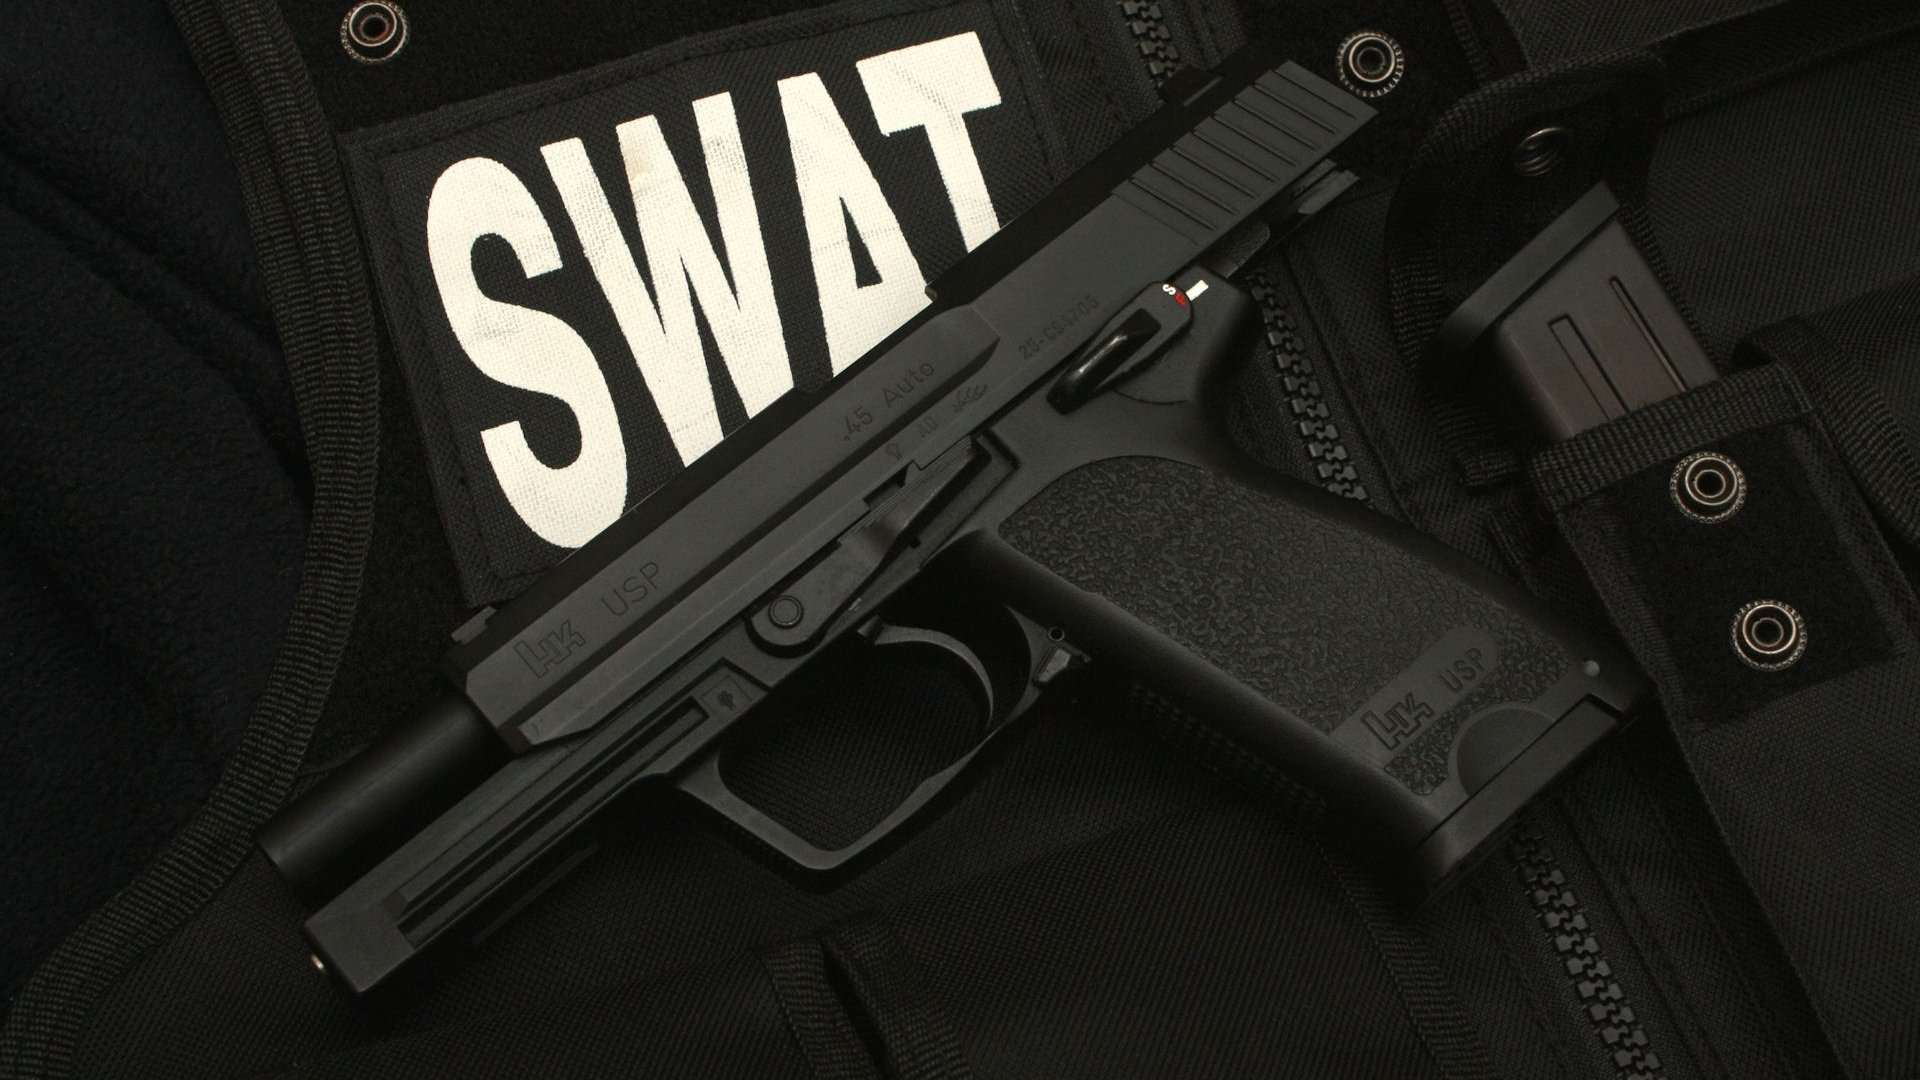 SWAT TEAM police crime emergency weapon gun wallpaper background 1920x1080